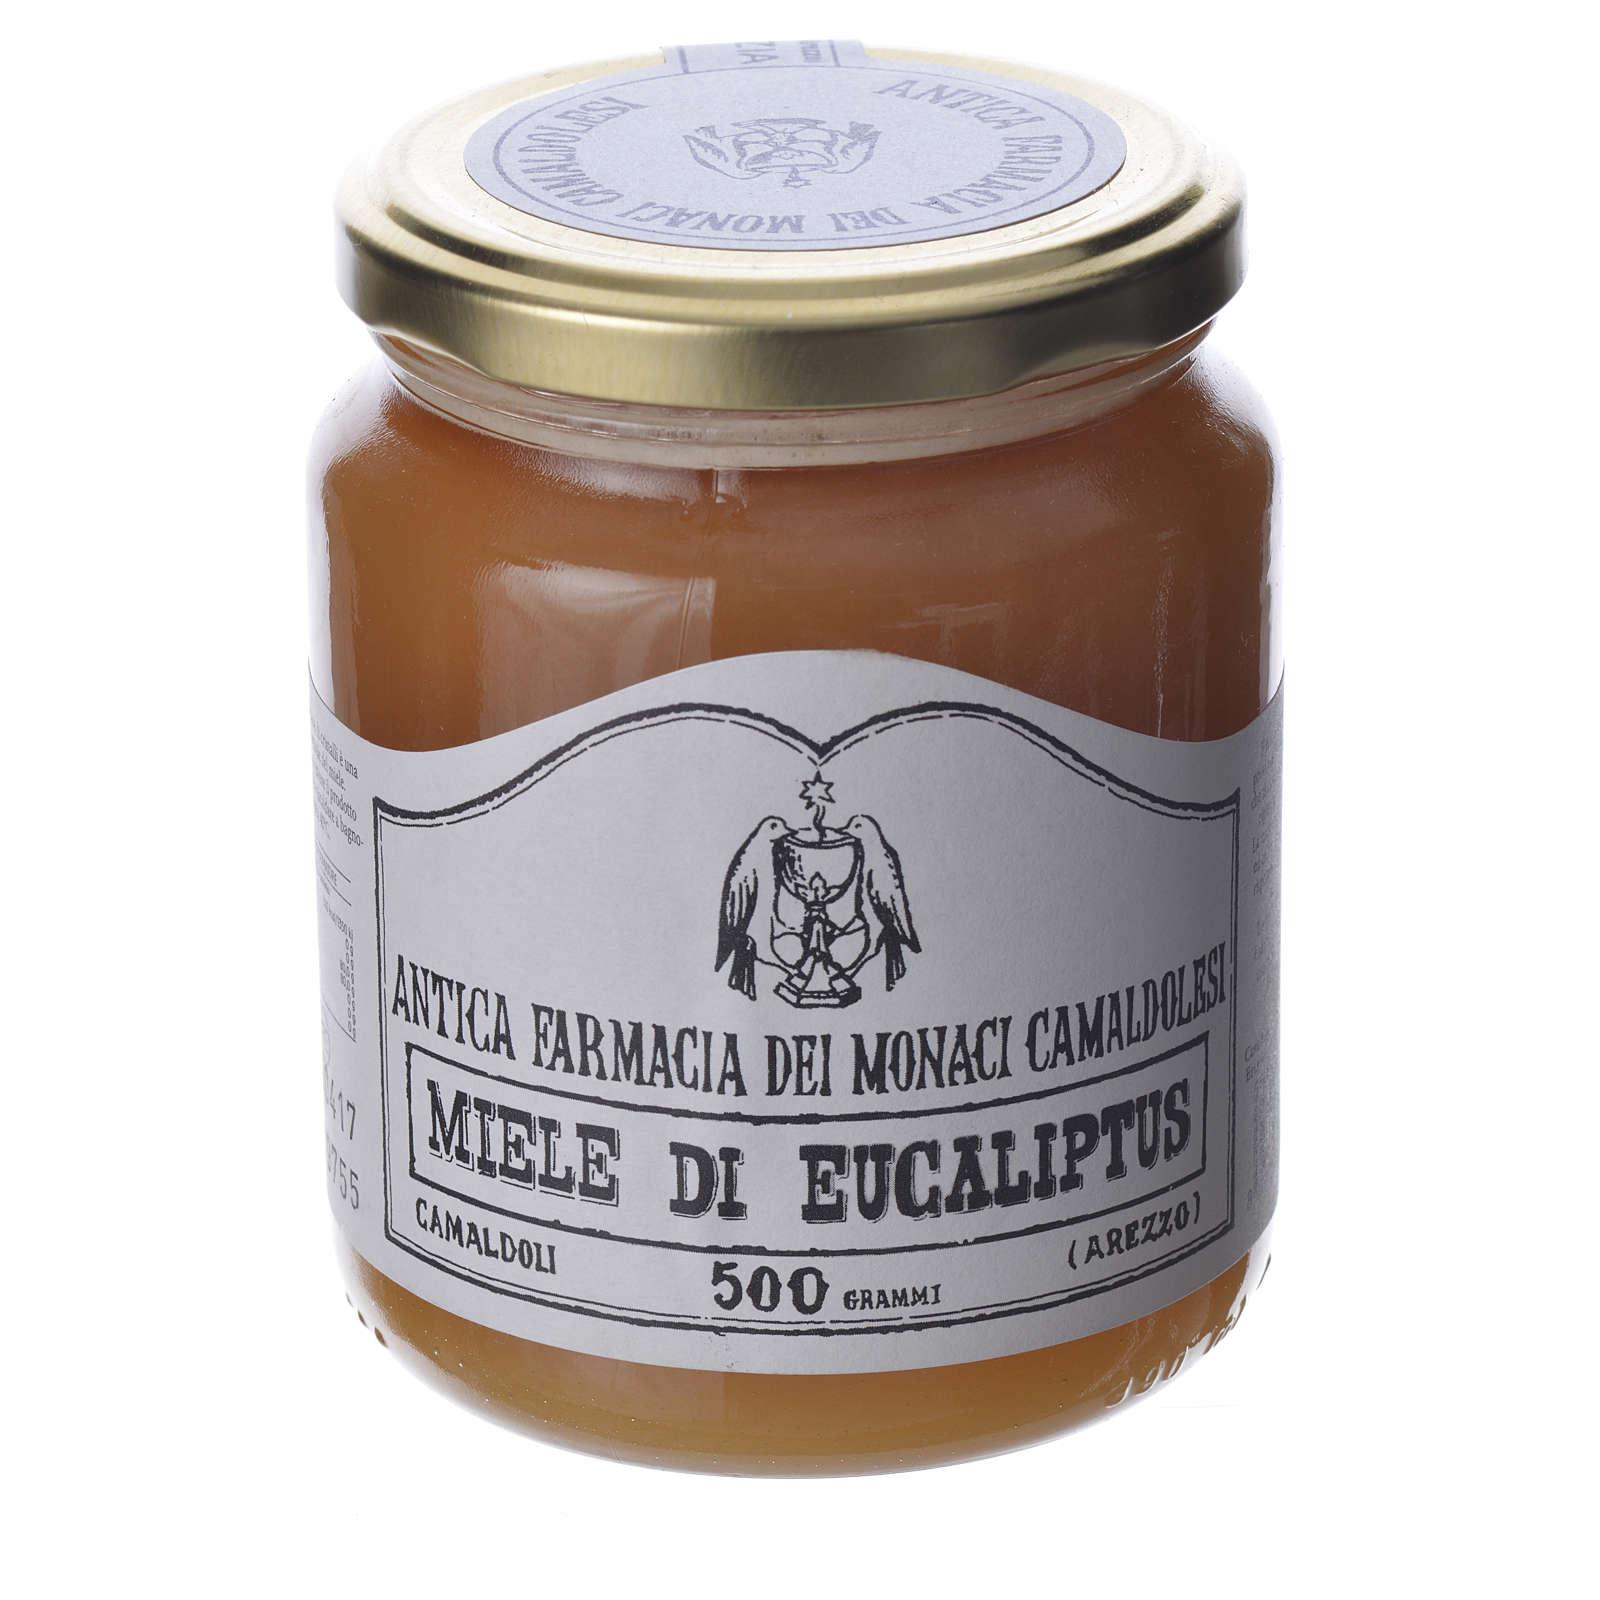 Miele di eucaliptus 500 gr Camaldoli 3